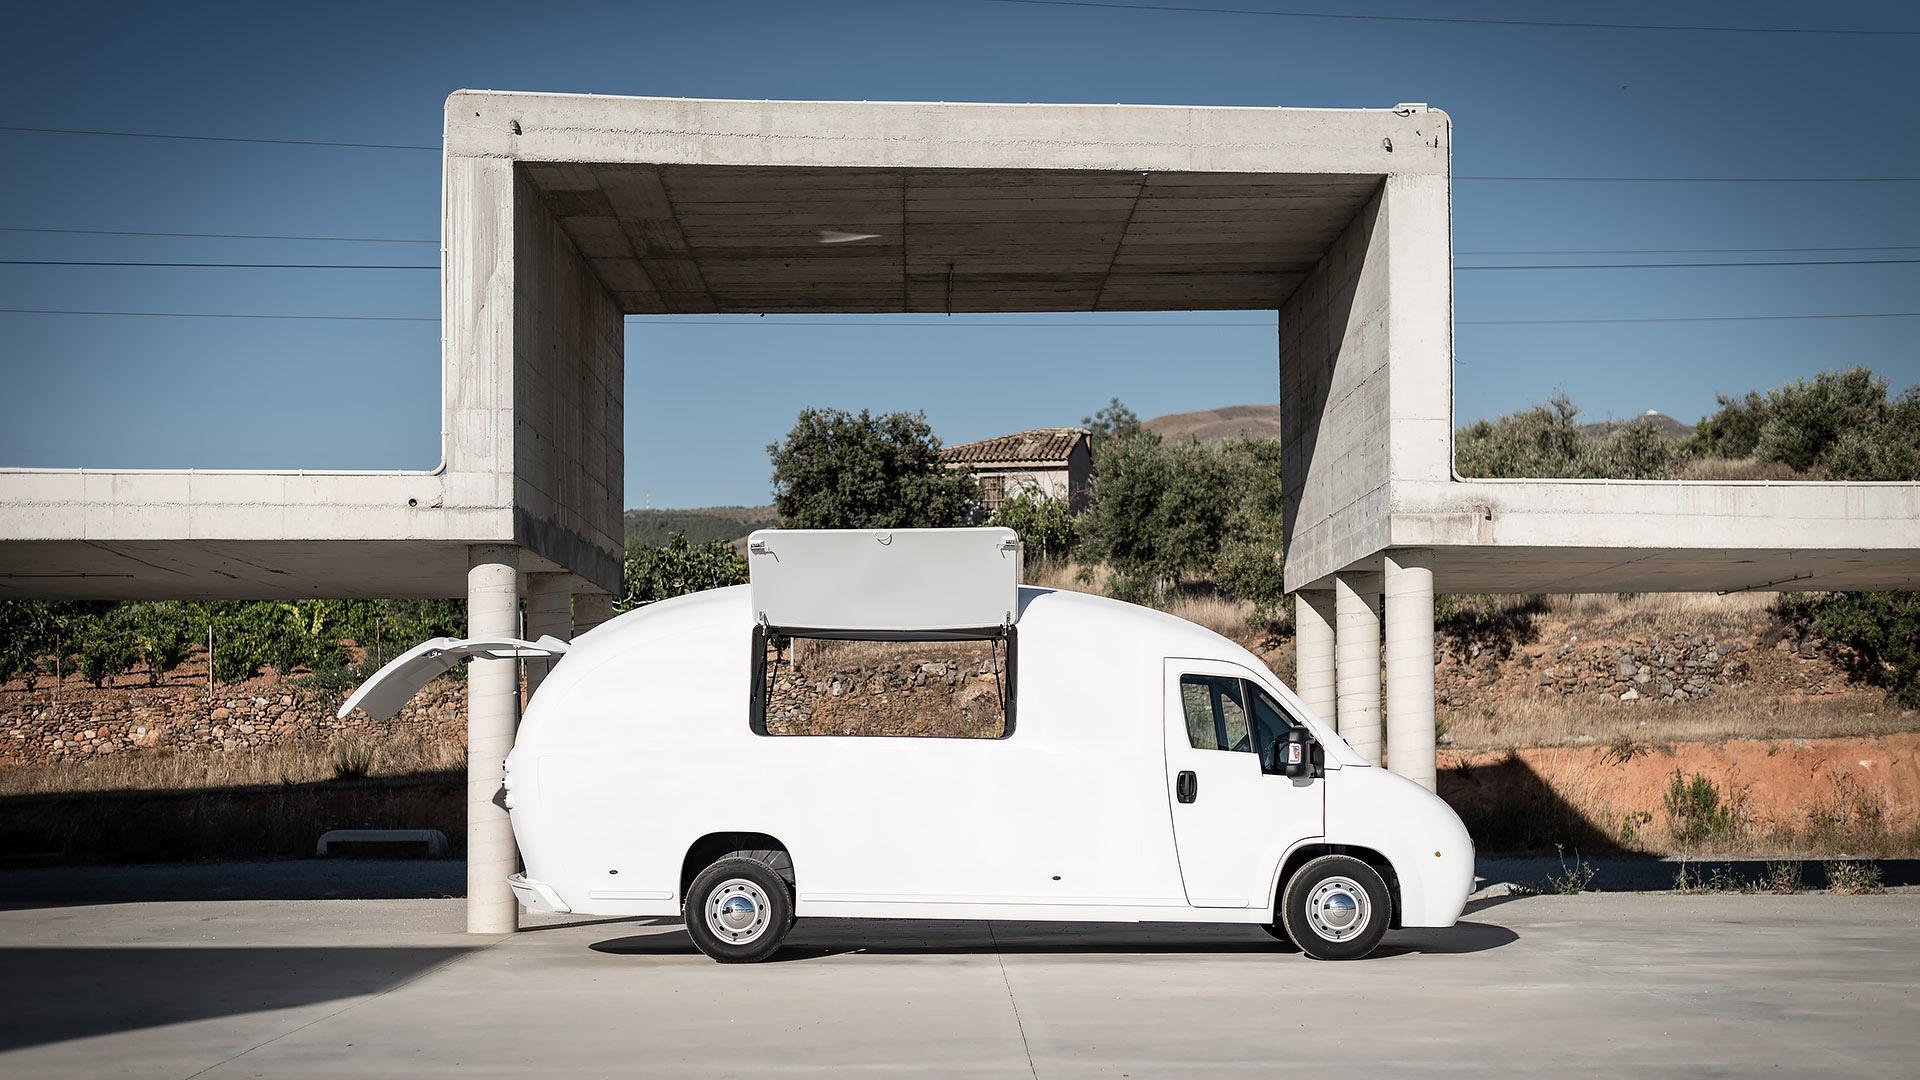 hurtan-fabricante-artesanal-espanol (28)